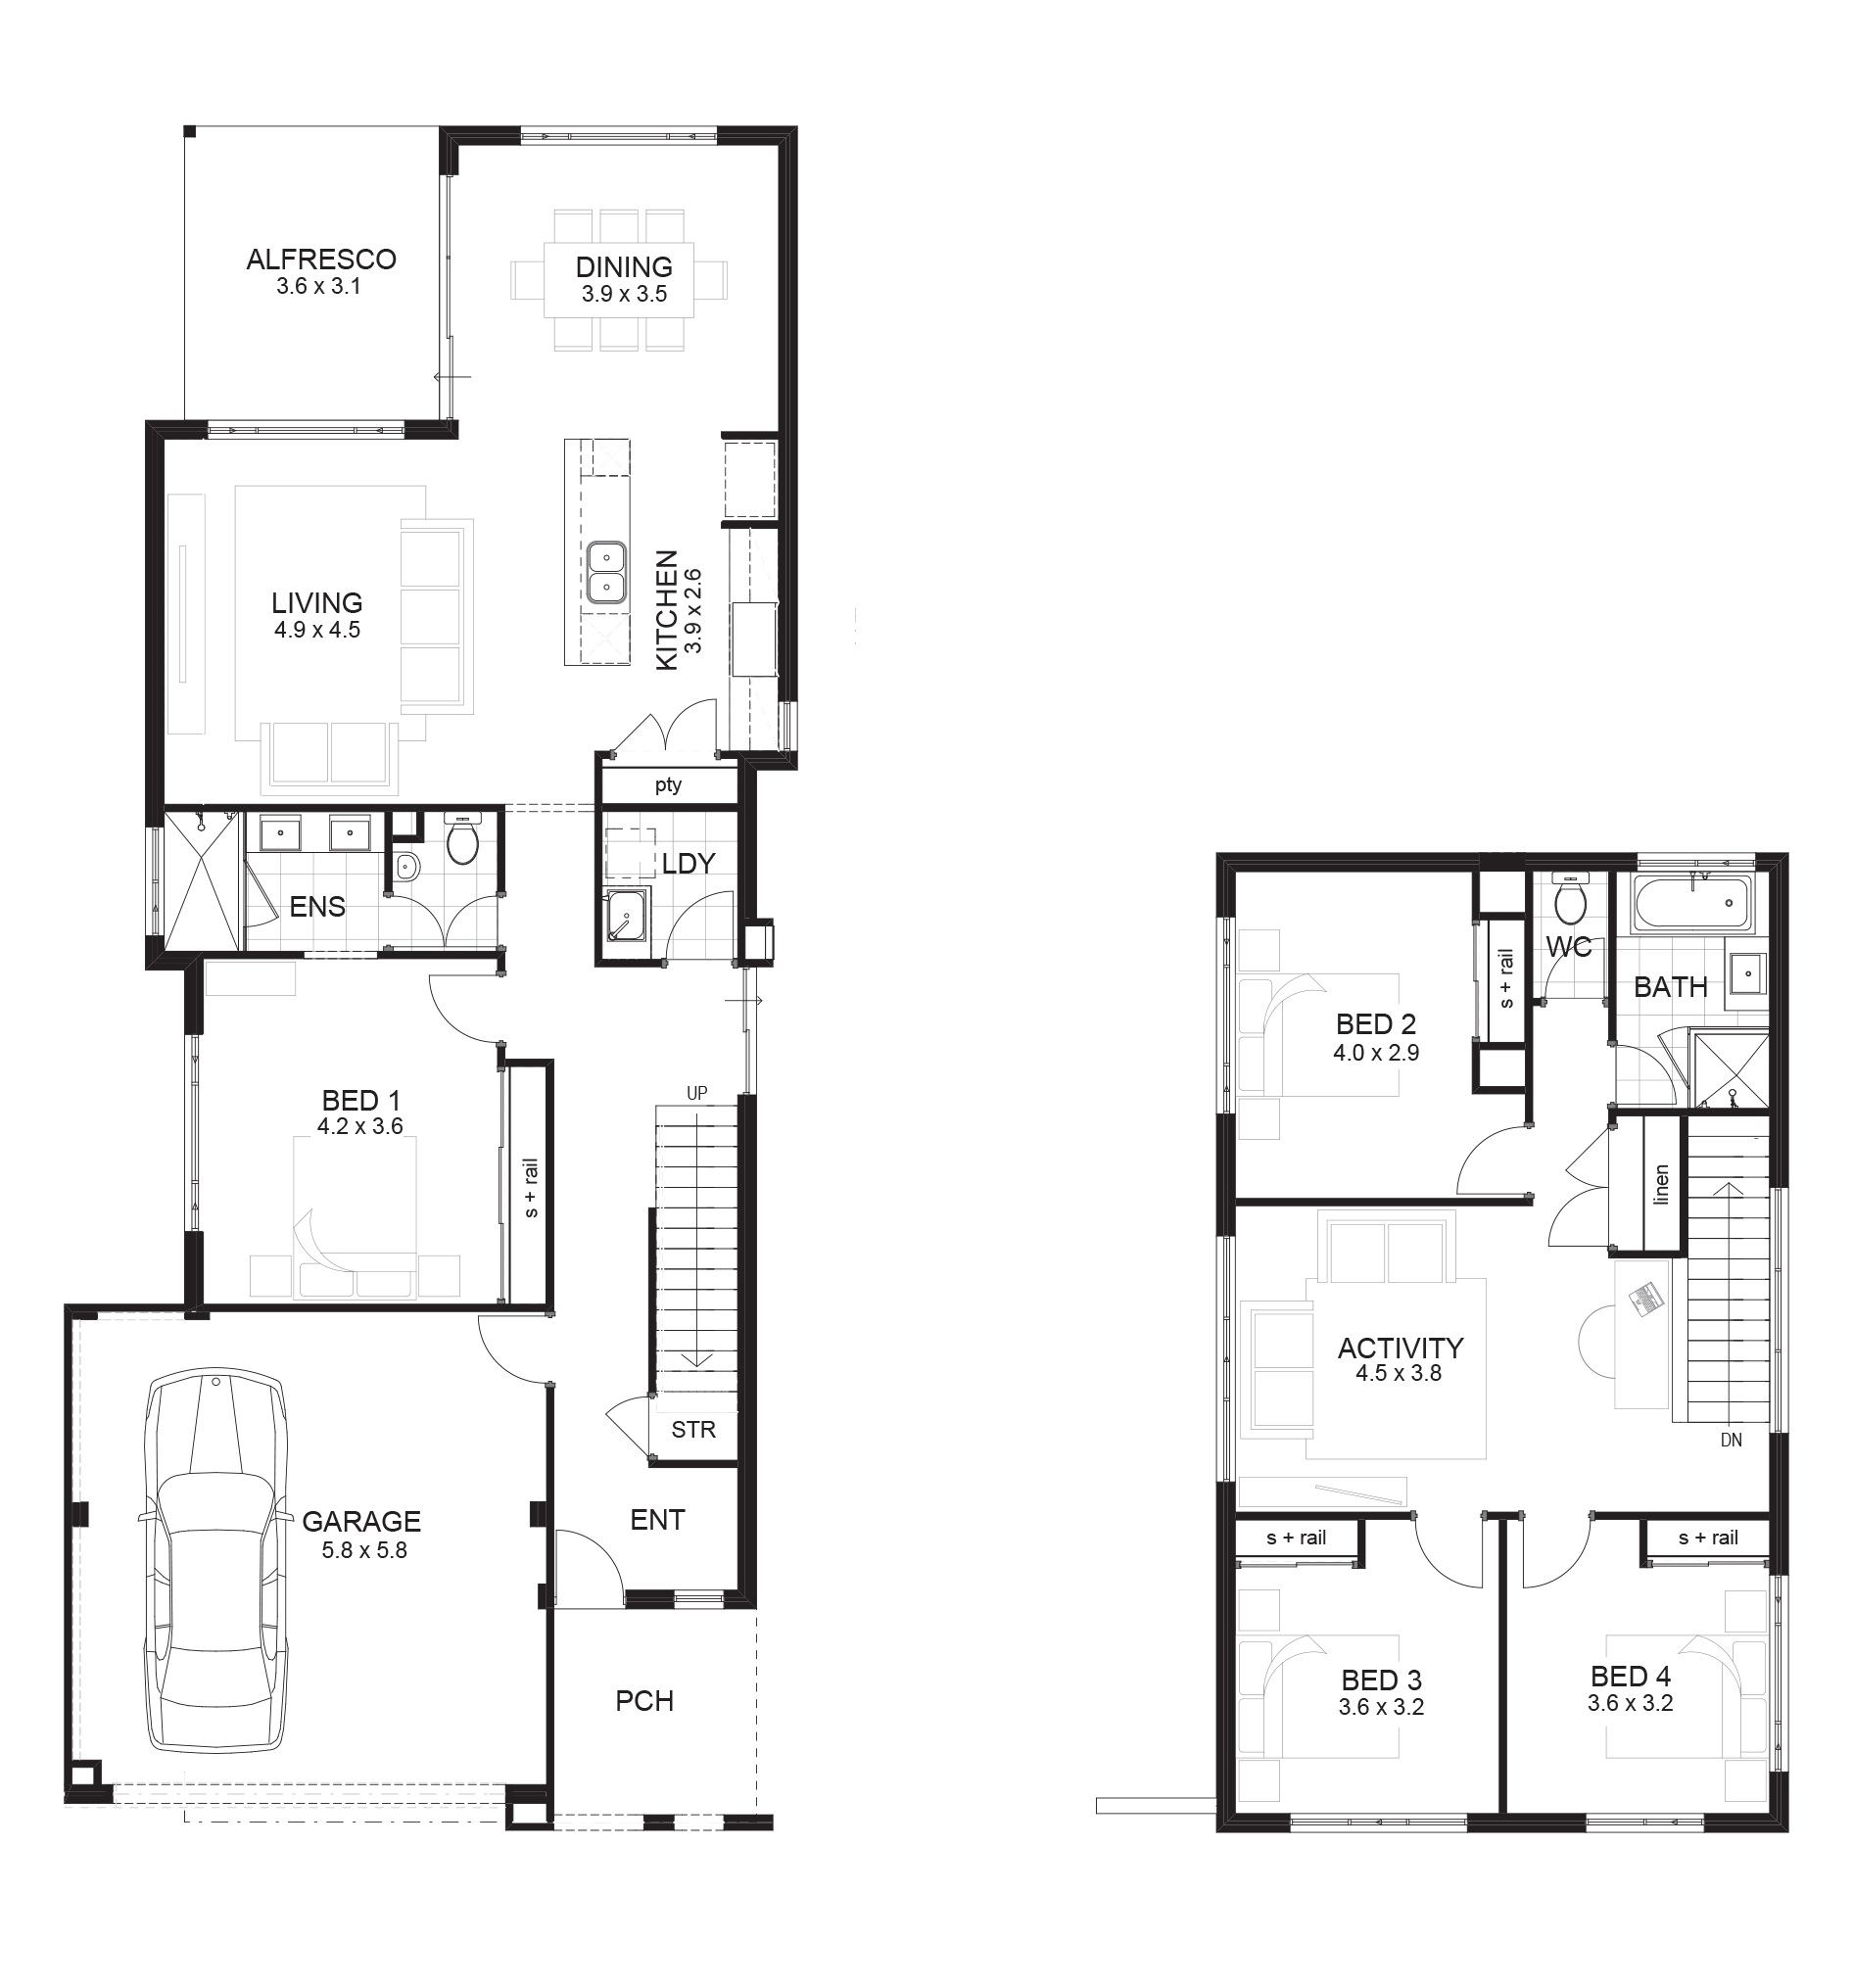 Small 4 Bedroom House Plans Australia